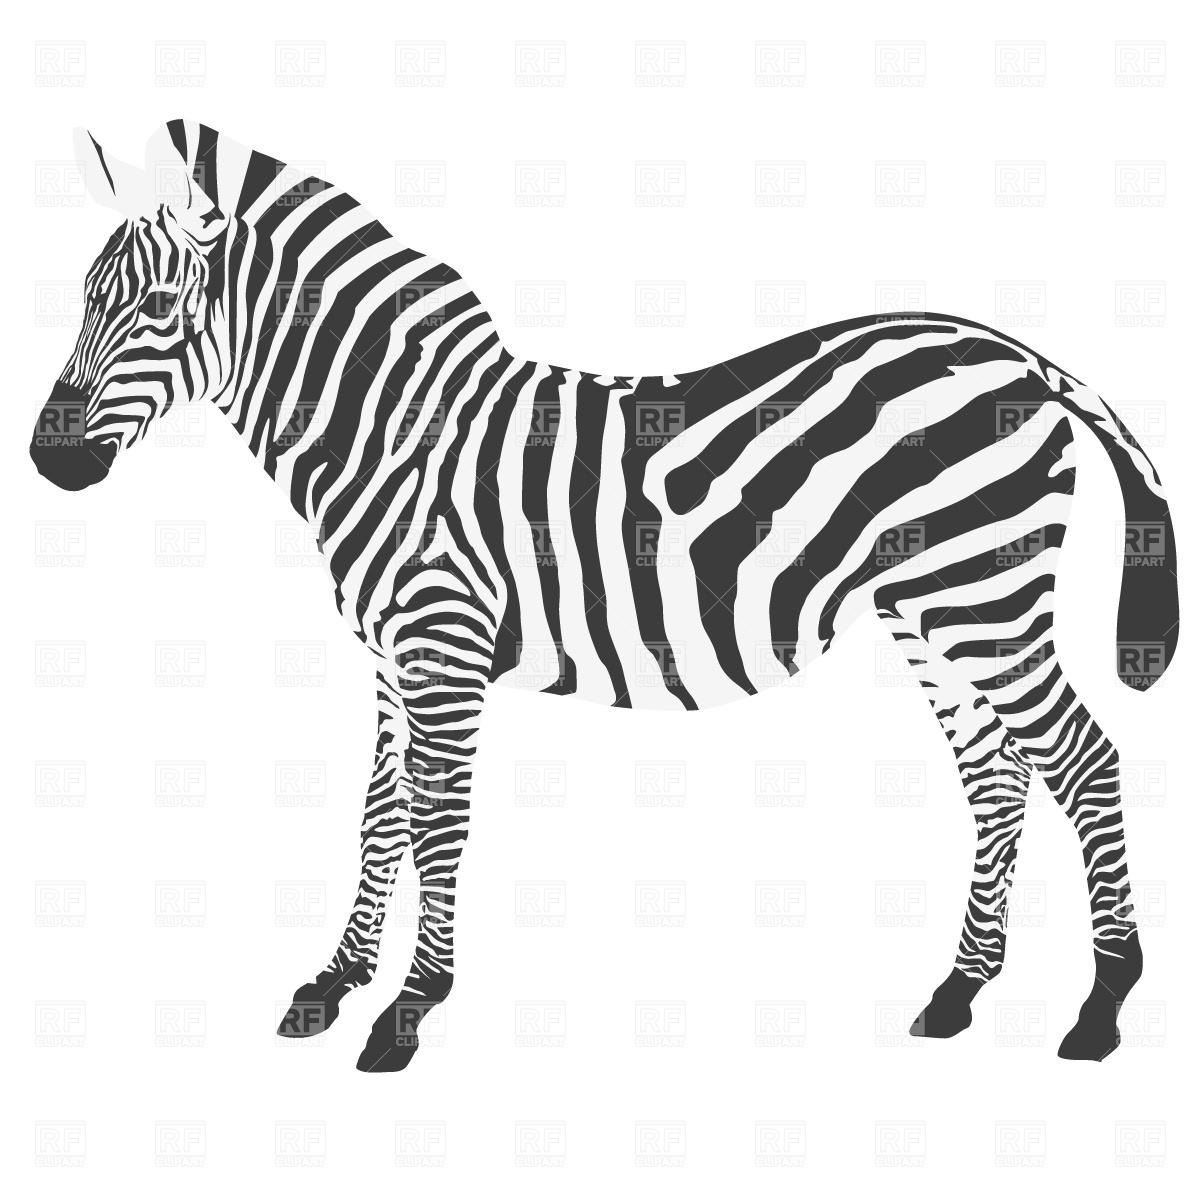 Zebra silhouette Stock Vector Image.